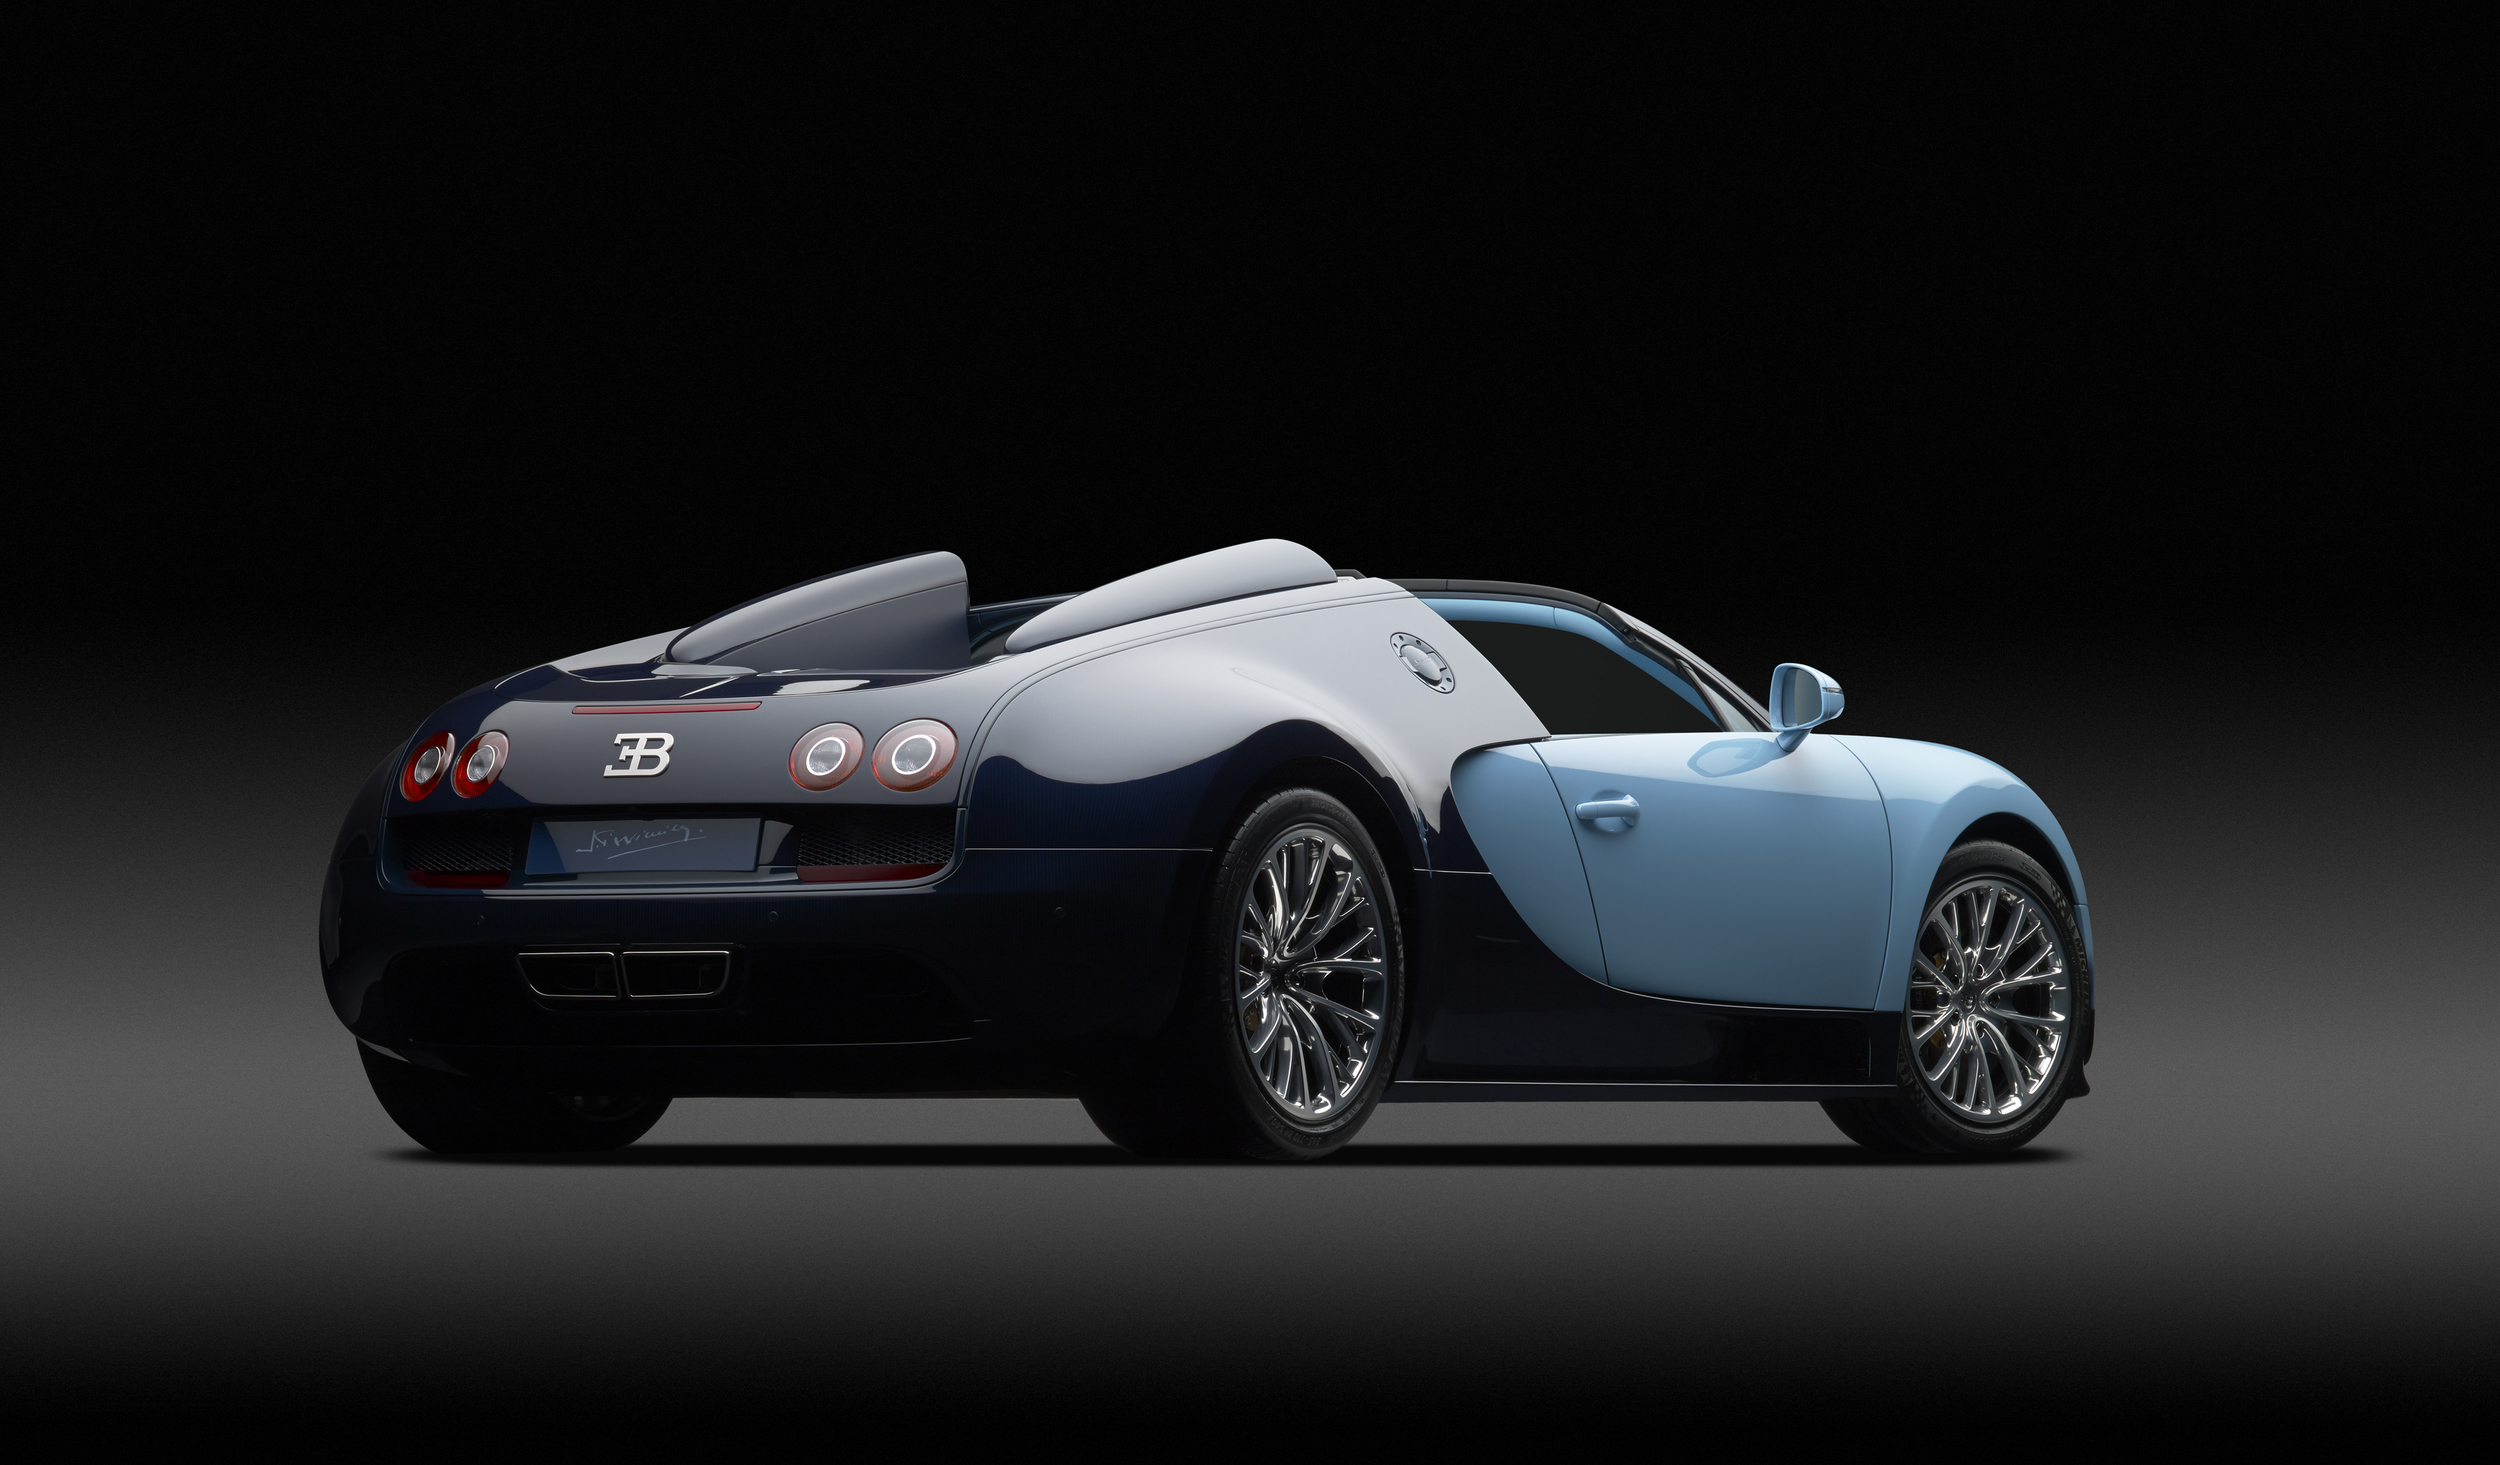 004_Bugatti_Vitesse_Legend_JP_Wimille.jpg